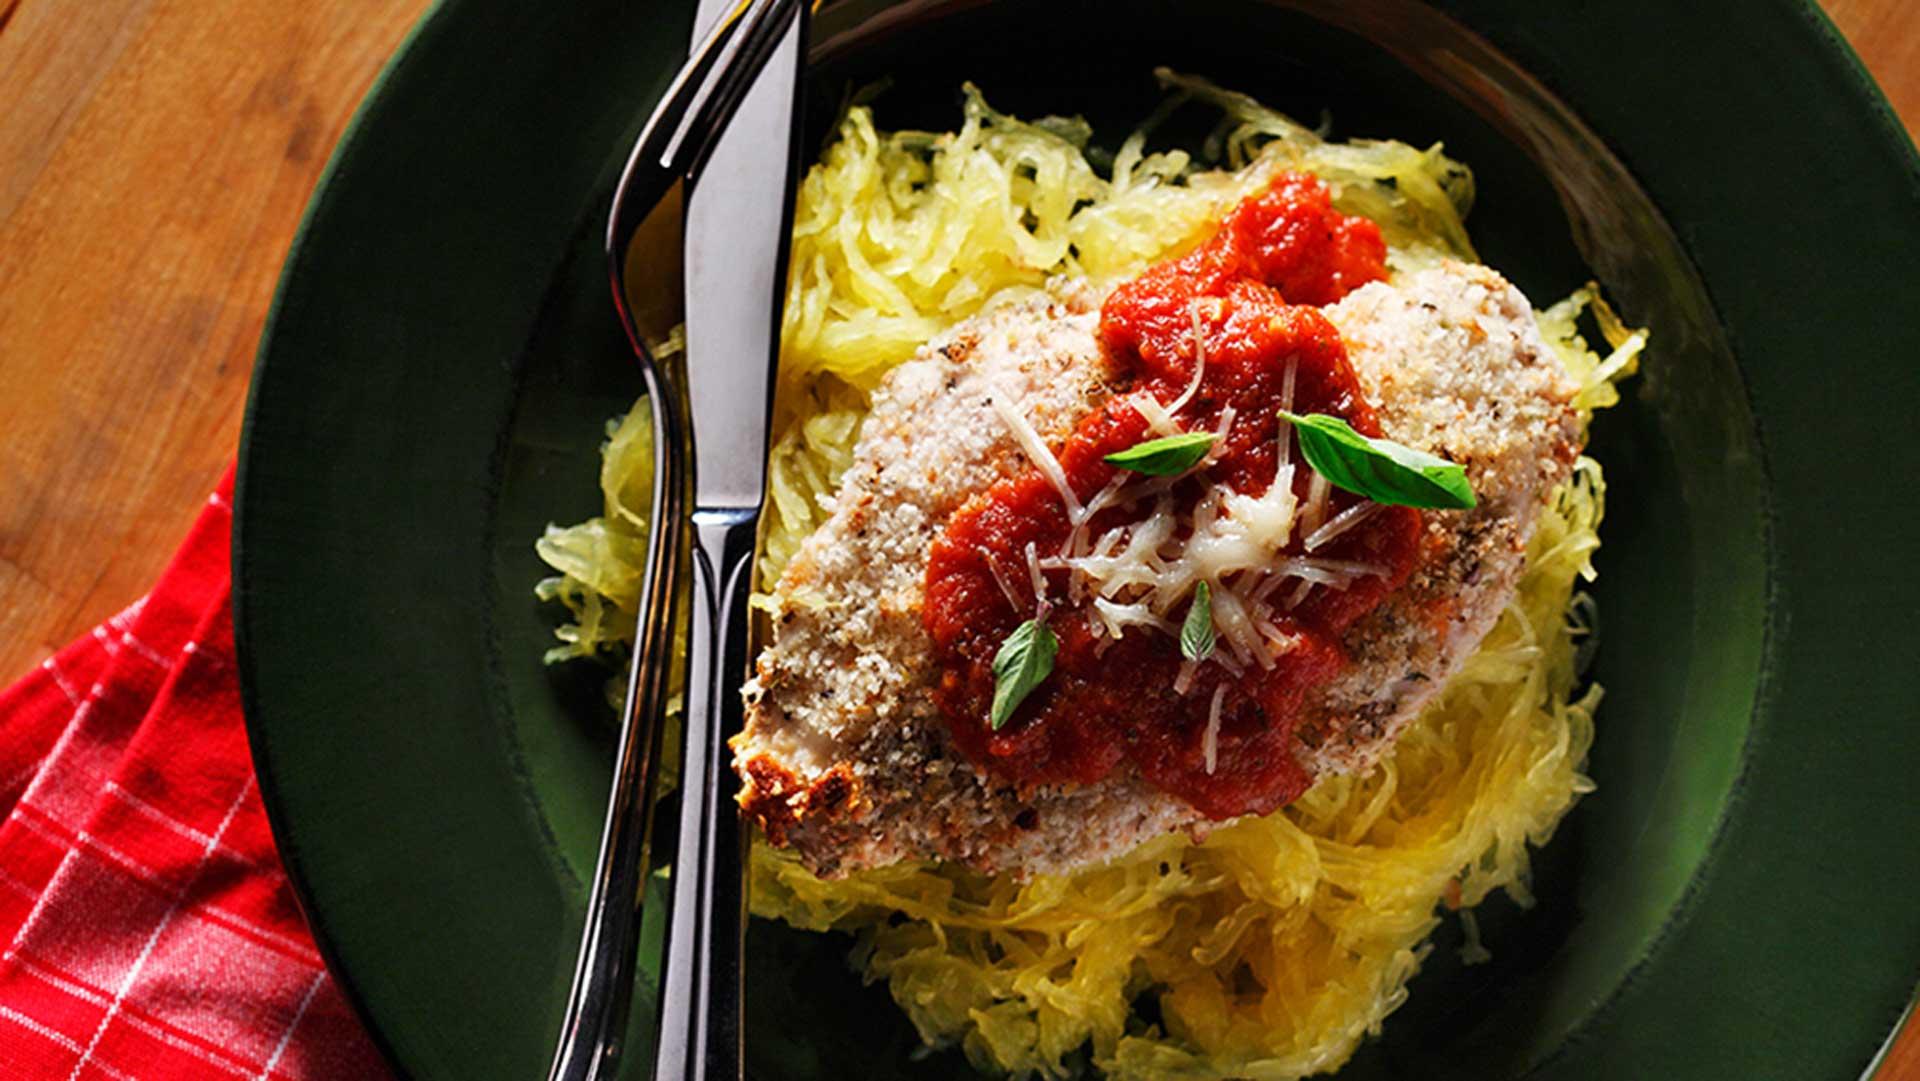 chicken parmigiana with spaghetti squash